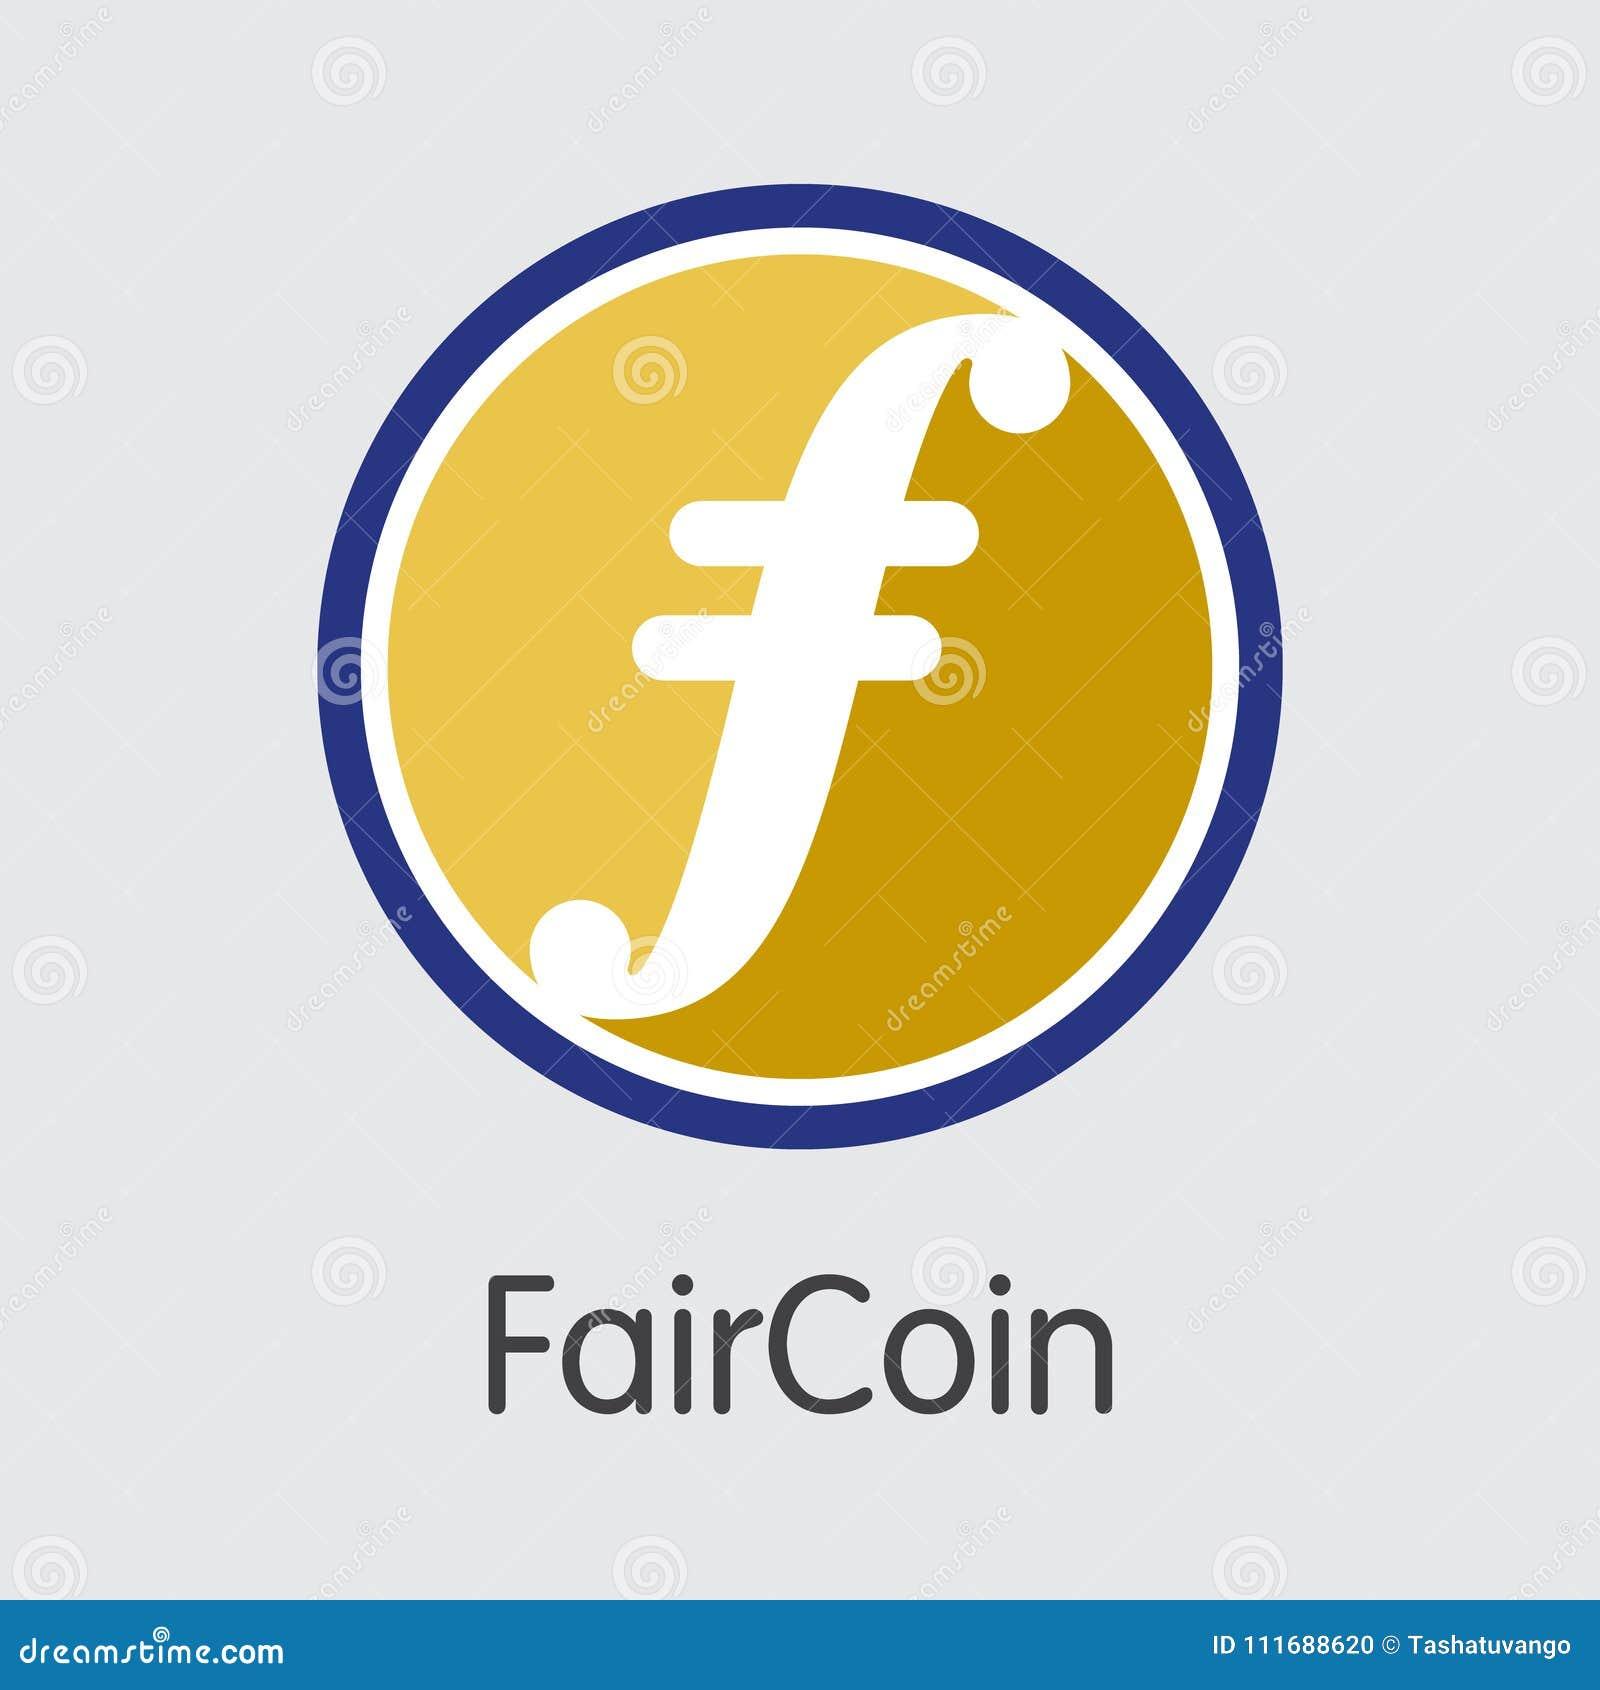 Faircoin Virtual Currency Coin Image Stock Vector Illustration